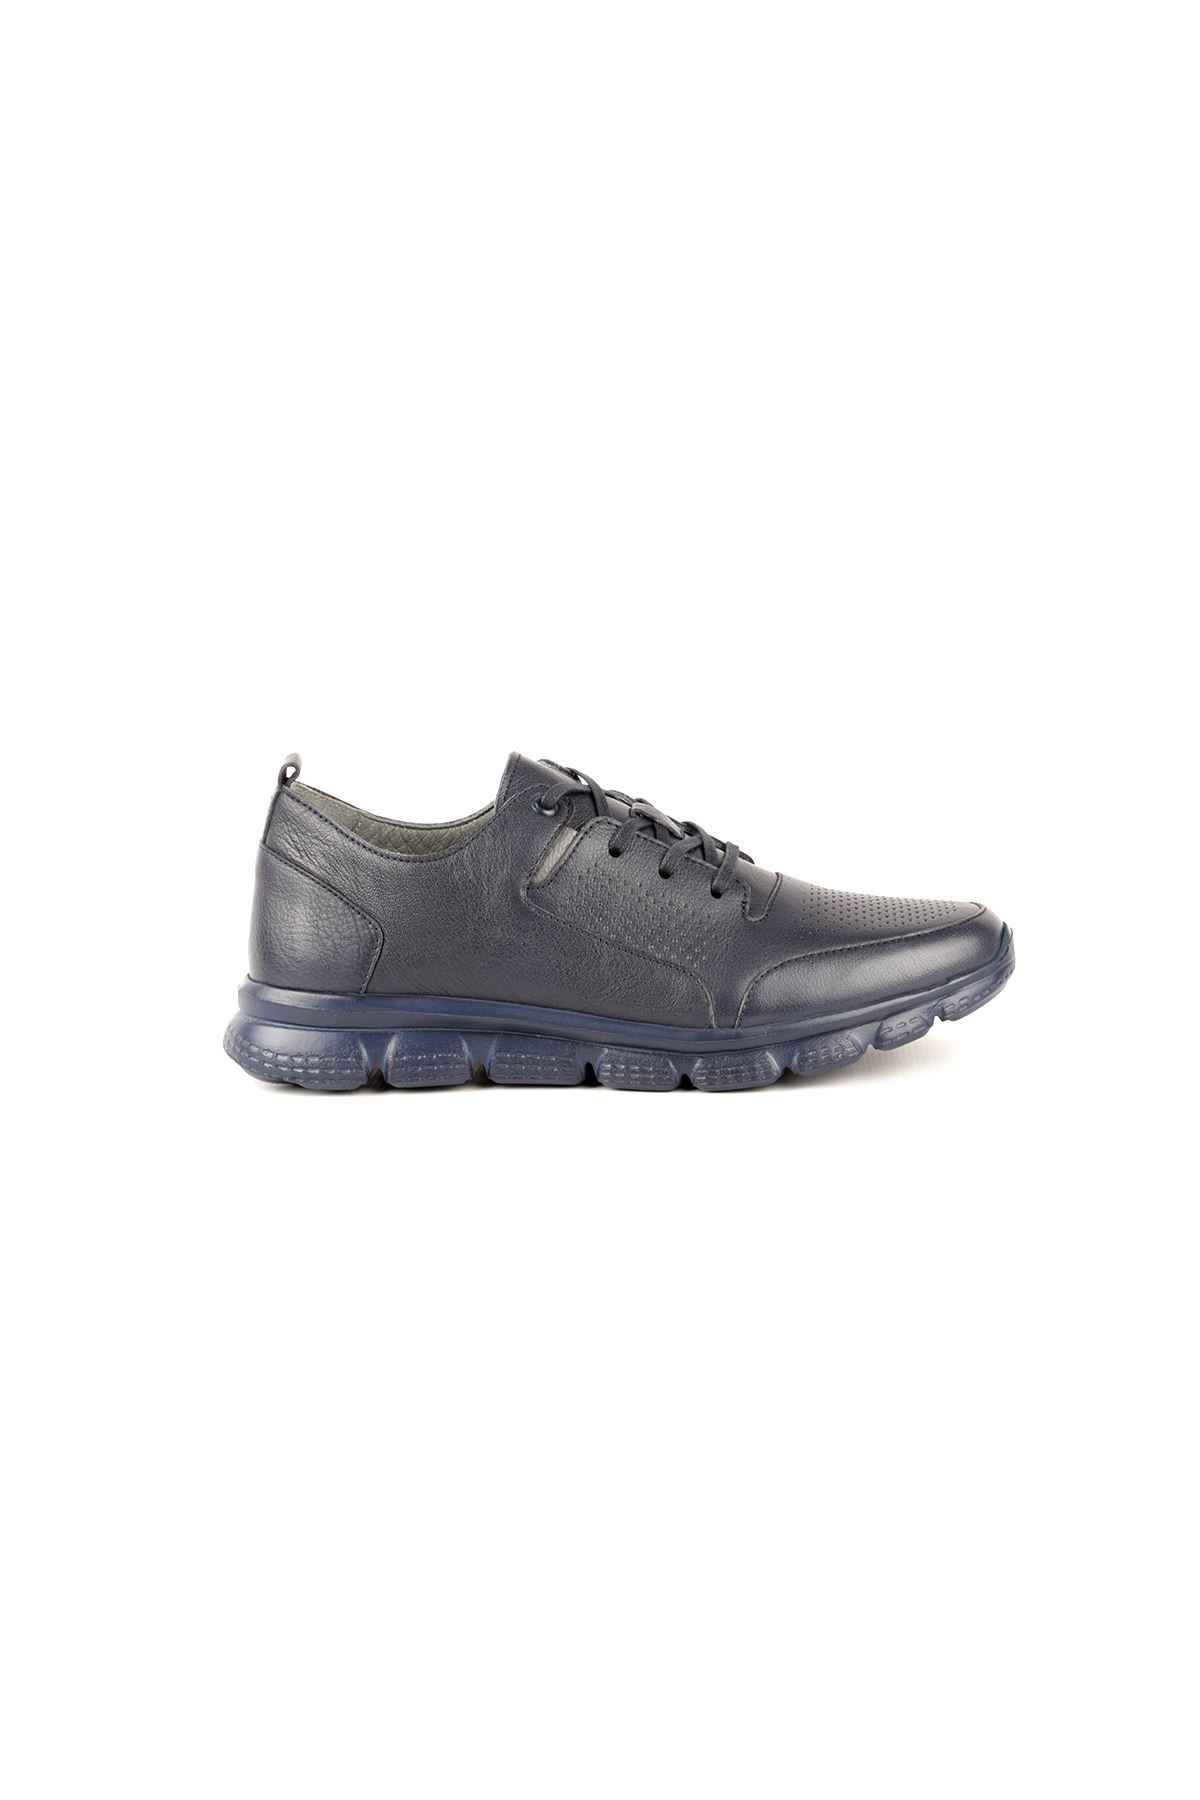 Libero L3621 Lacivert Spor Ayakkabı